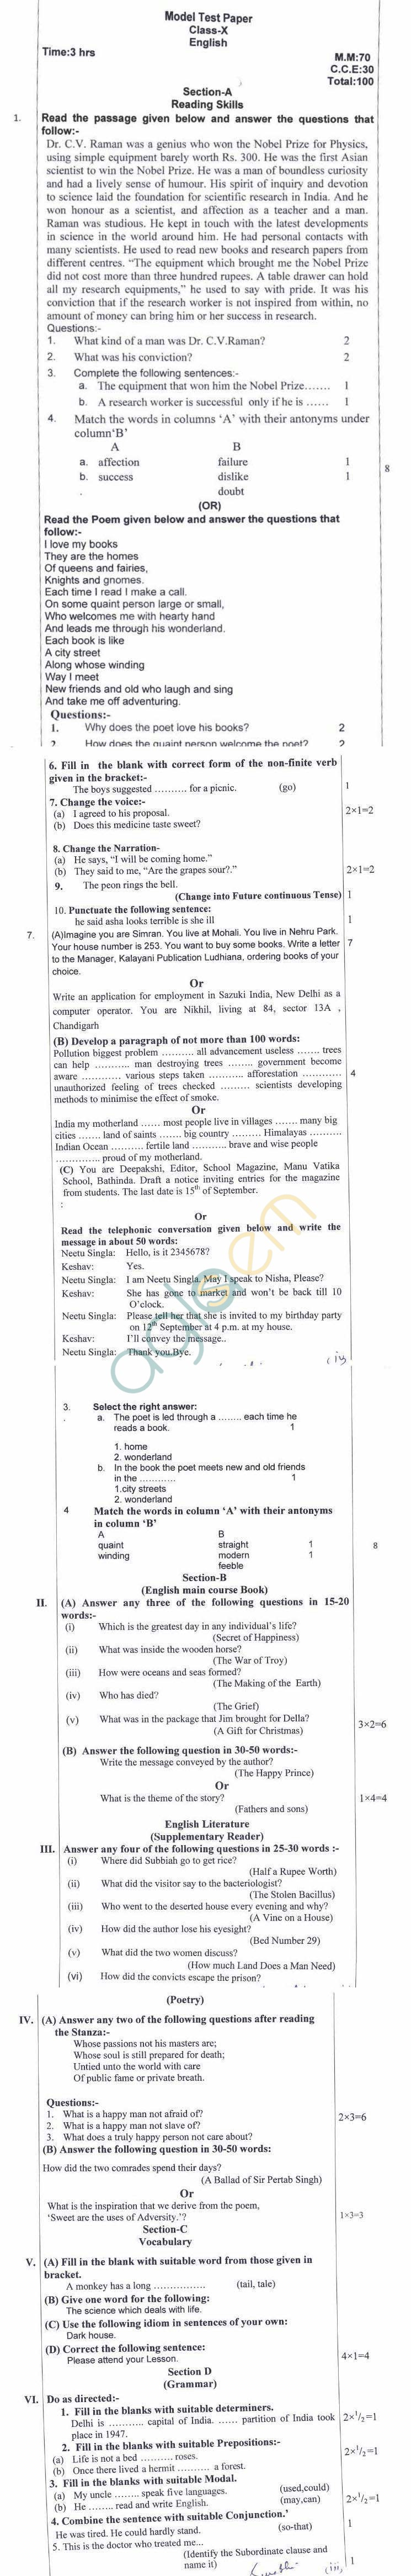 pseb sample paper for class 10 english aglasem schools rh schools aglasem com Punjab Board Education School Bus Board Exam